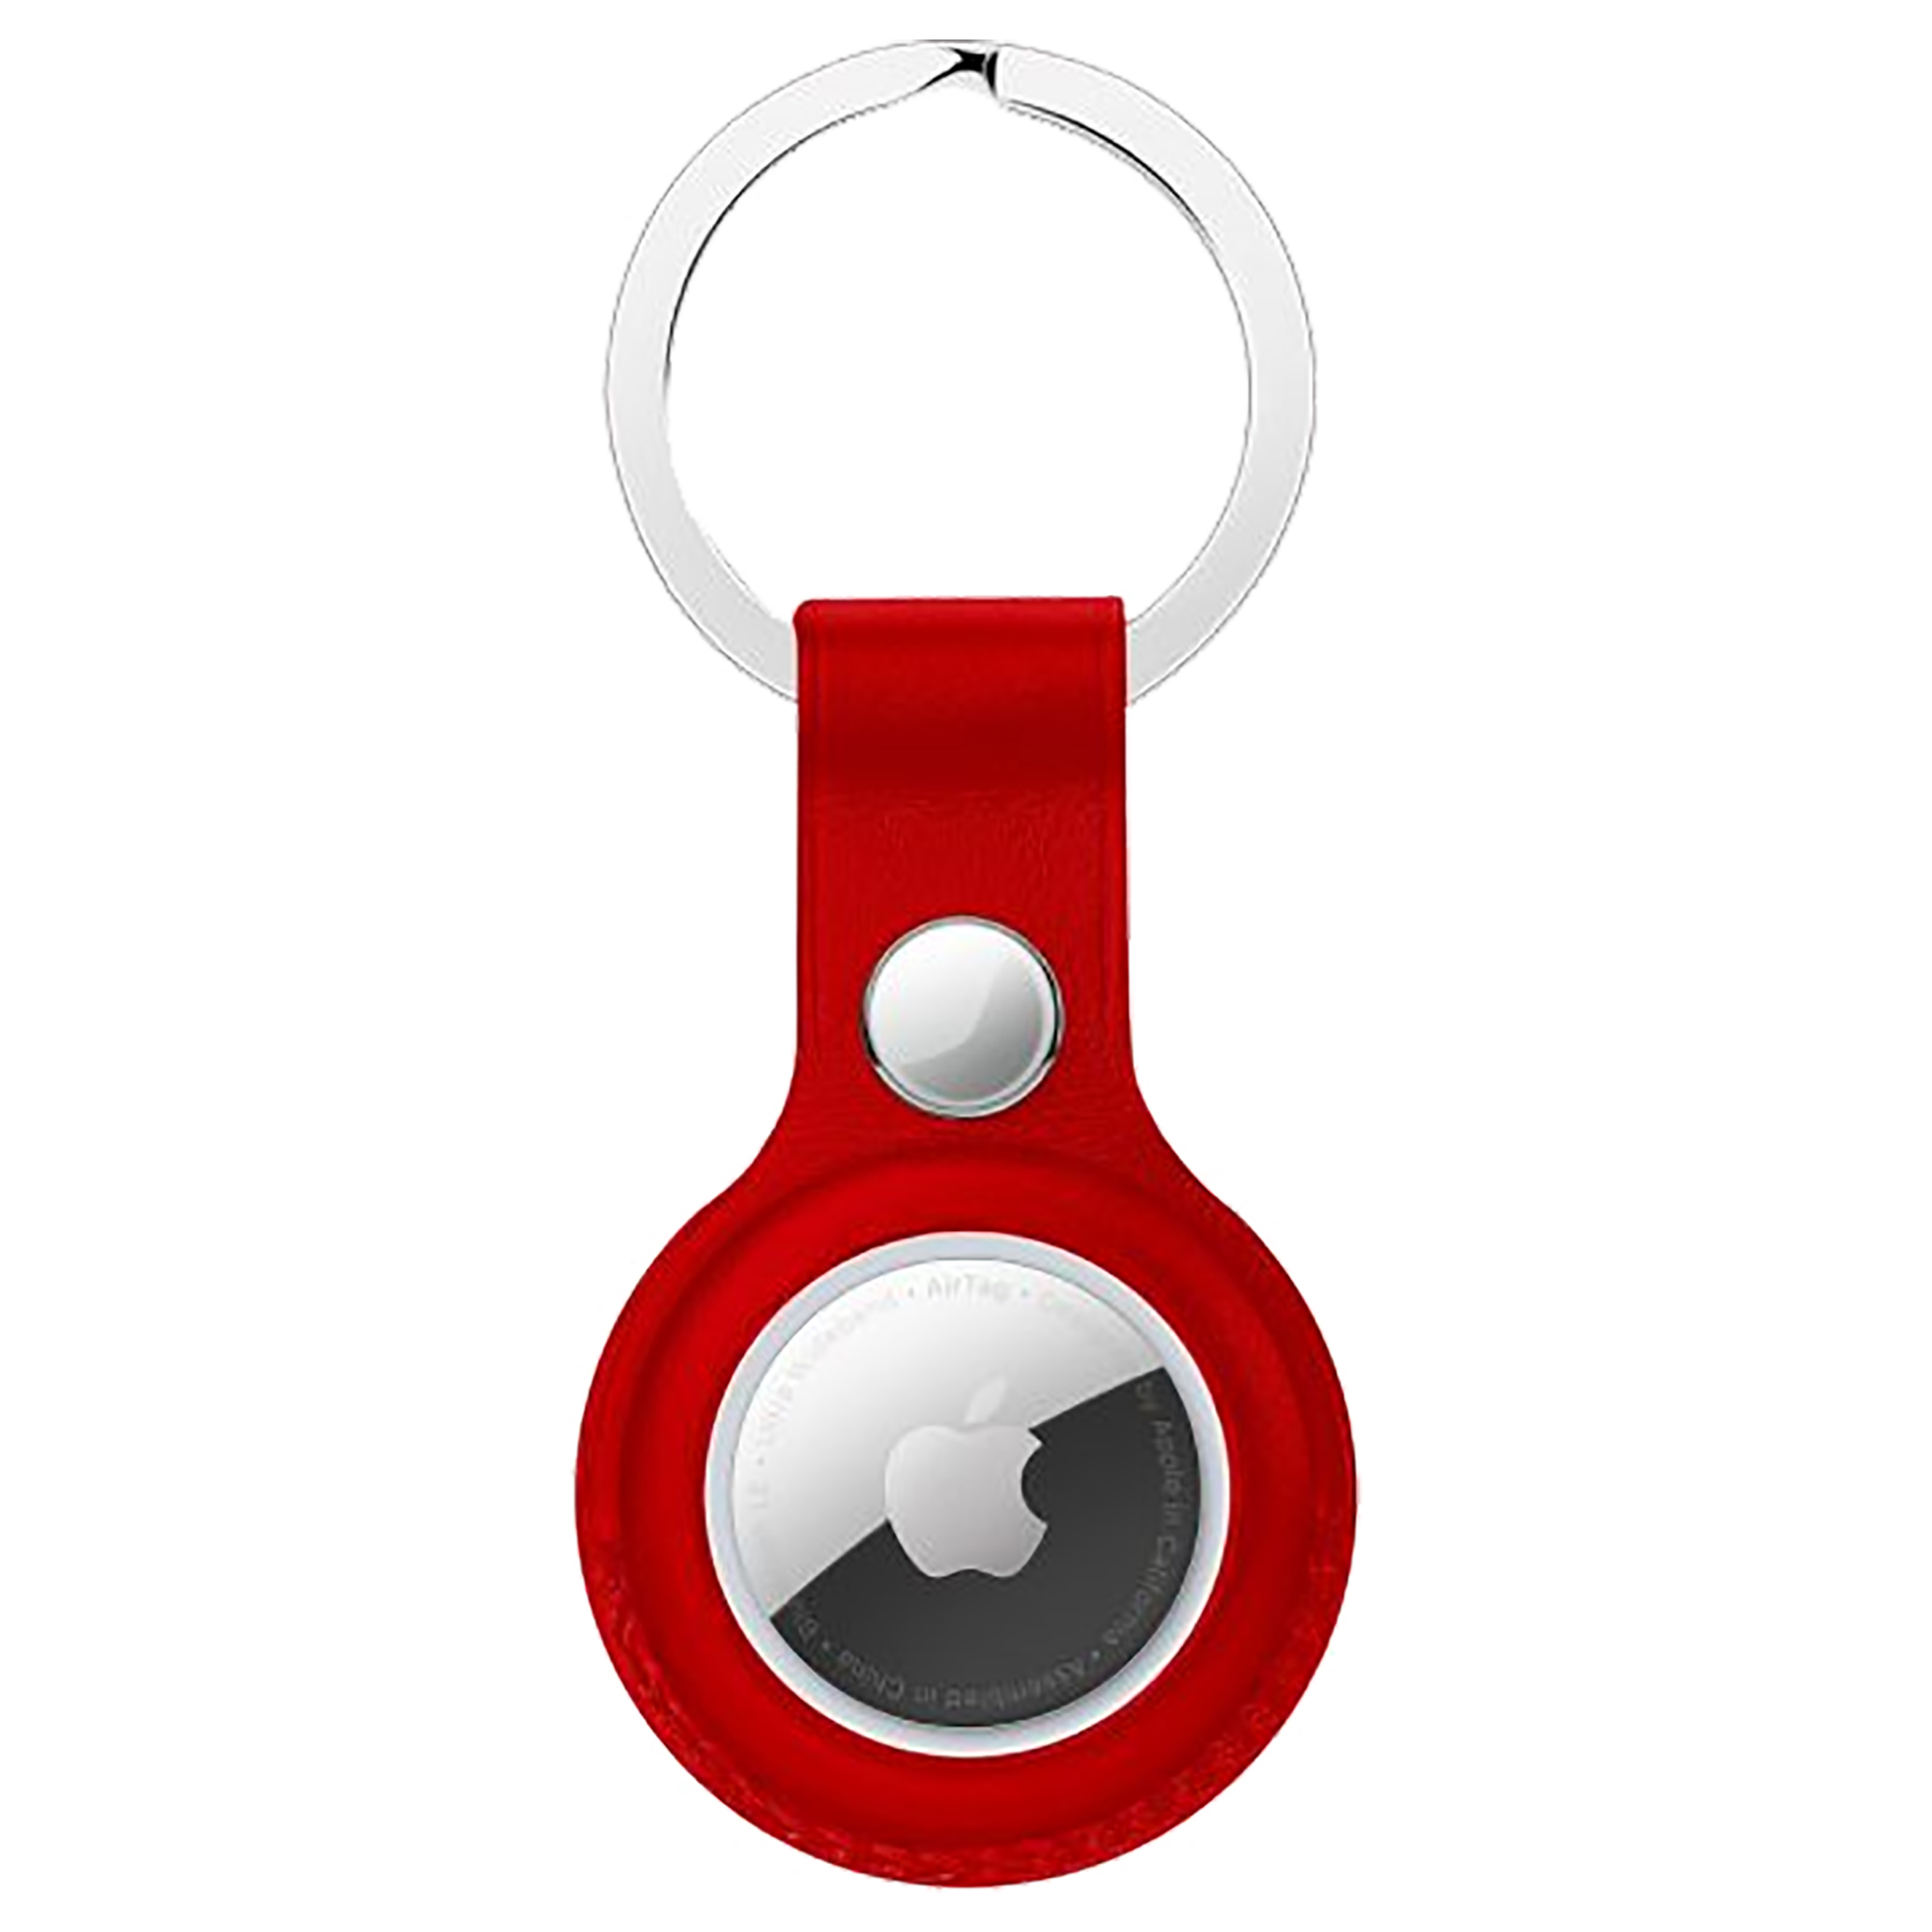 HYPHEN HAT-KRLRED5758 Polyurethane Silicone Key Ring Case (Lightweight & Durable, Red)_1